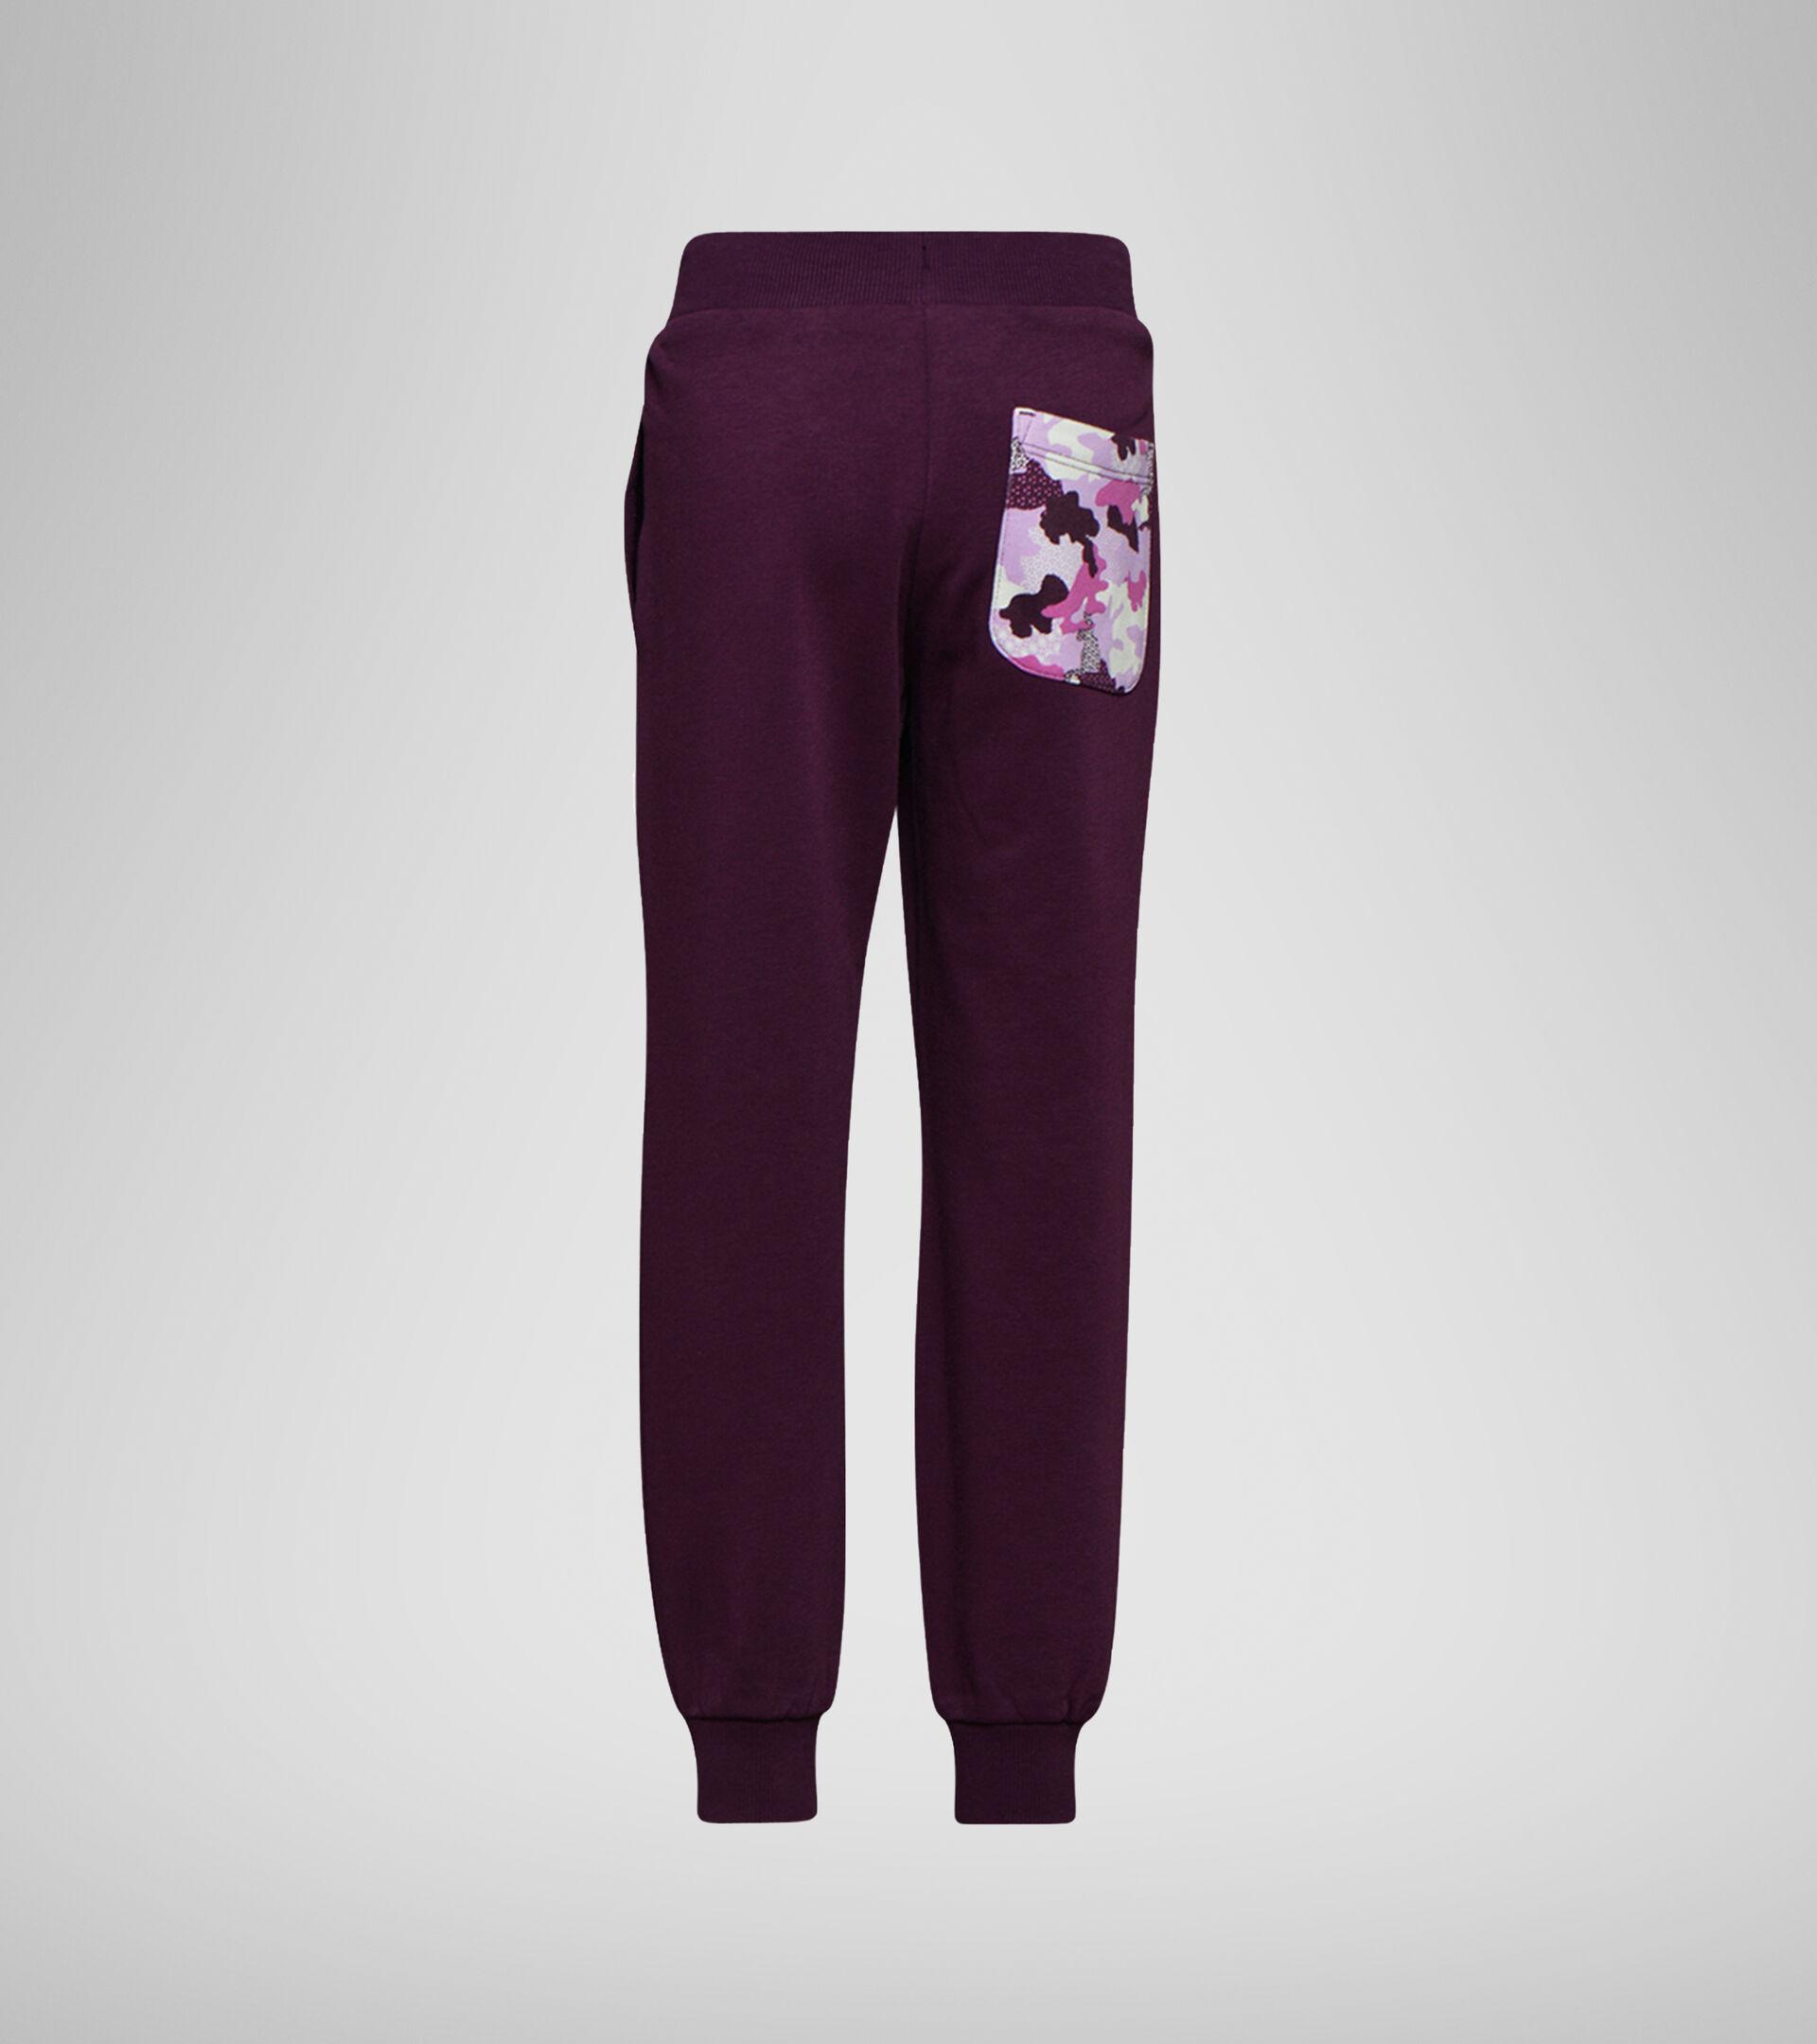 Sports trousers - Boys and girls JU.CUFF PANTS CHROMIA VIOLET GRAPE - Diadora